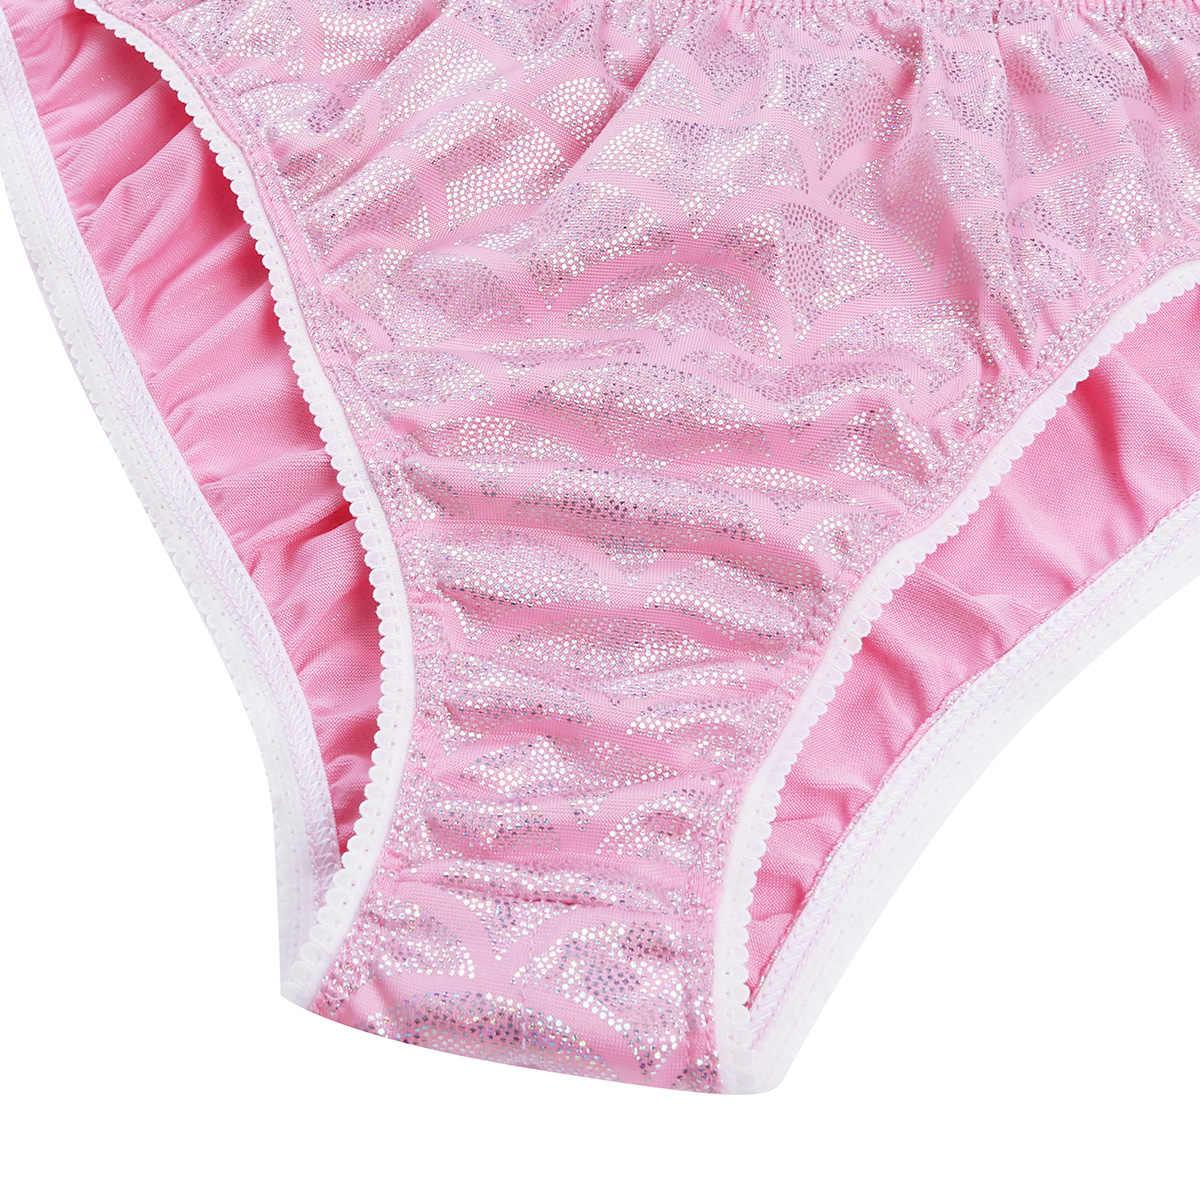 0ff8c6b9c47a ... Men Mermaid Scale Bikini Sissy Stretch Ruched Back Briefs Low Rise  Penis Pouch Underwear Bulge Thongs